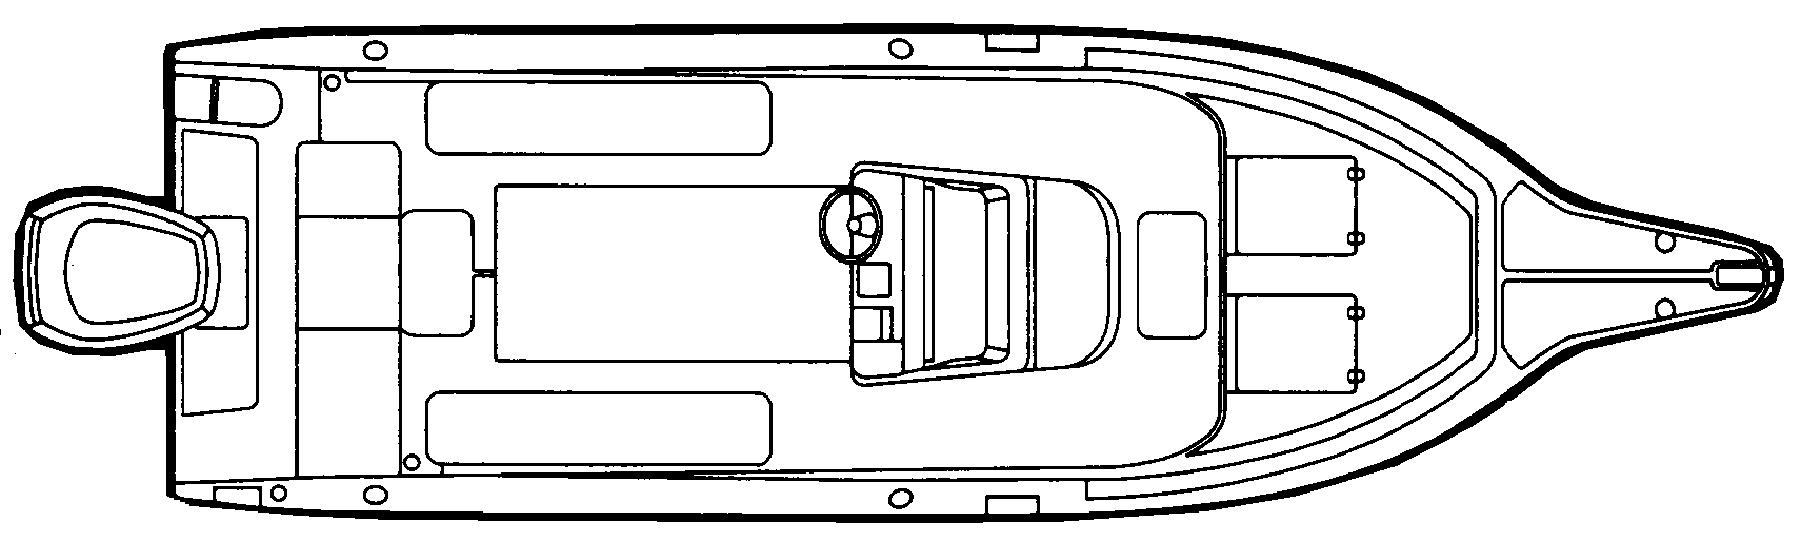 274 Center Console Floor Plan 1